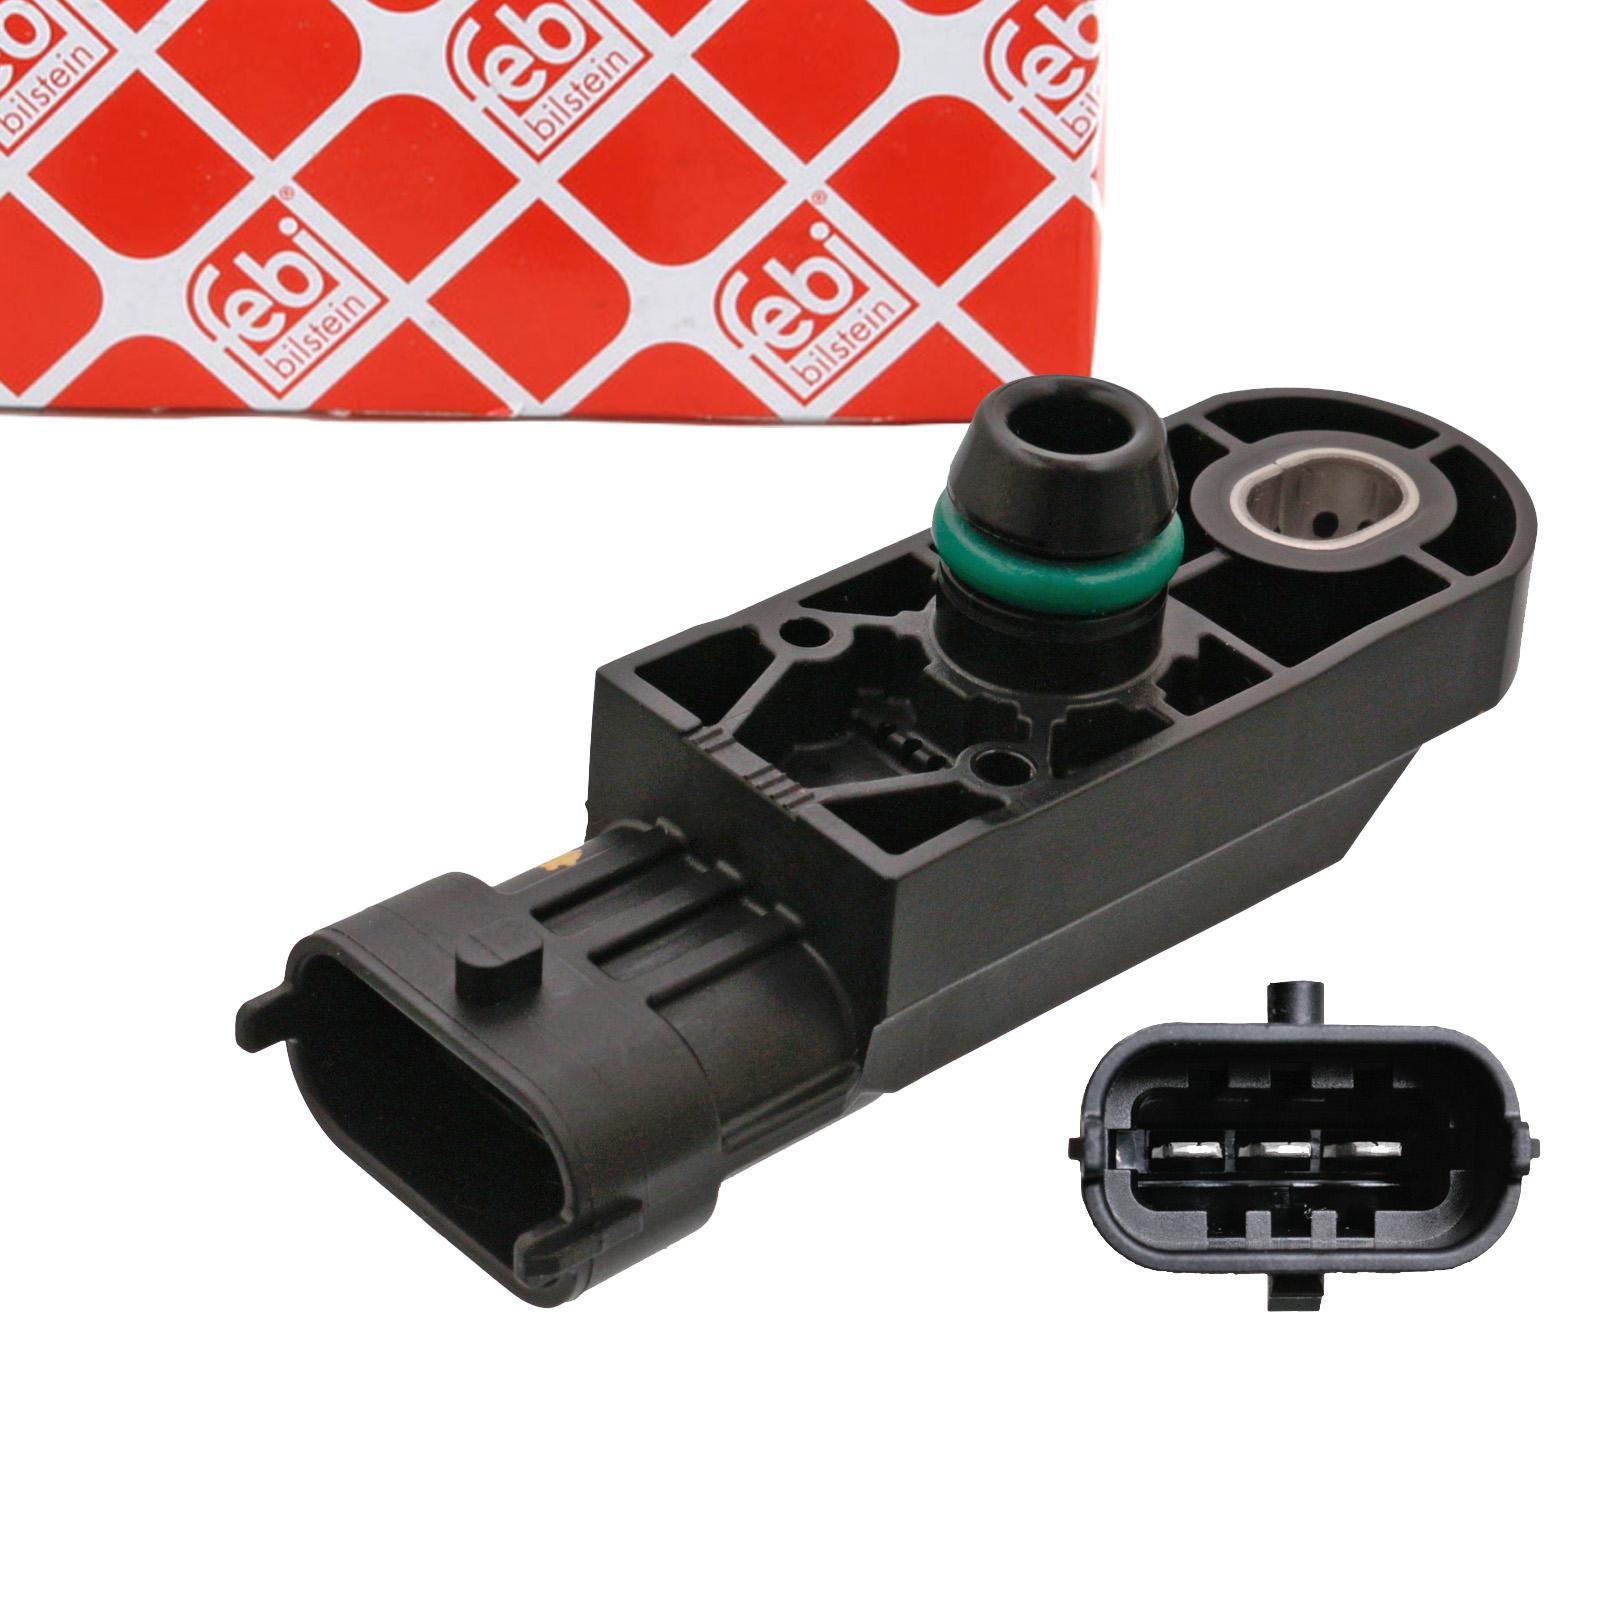 FEBI 49441 Saugrohrdrucksensor MERCEDES Citan 415 OPEL Movano X70 FIAT 500 Punto 199 Panda